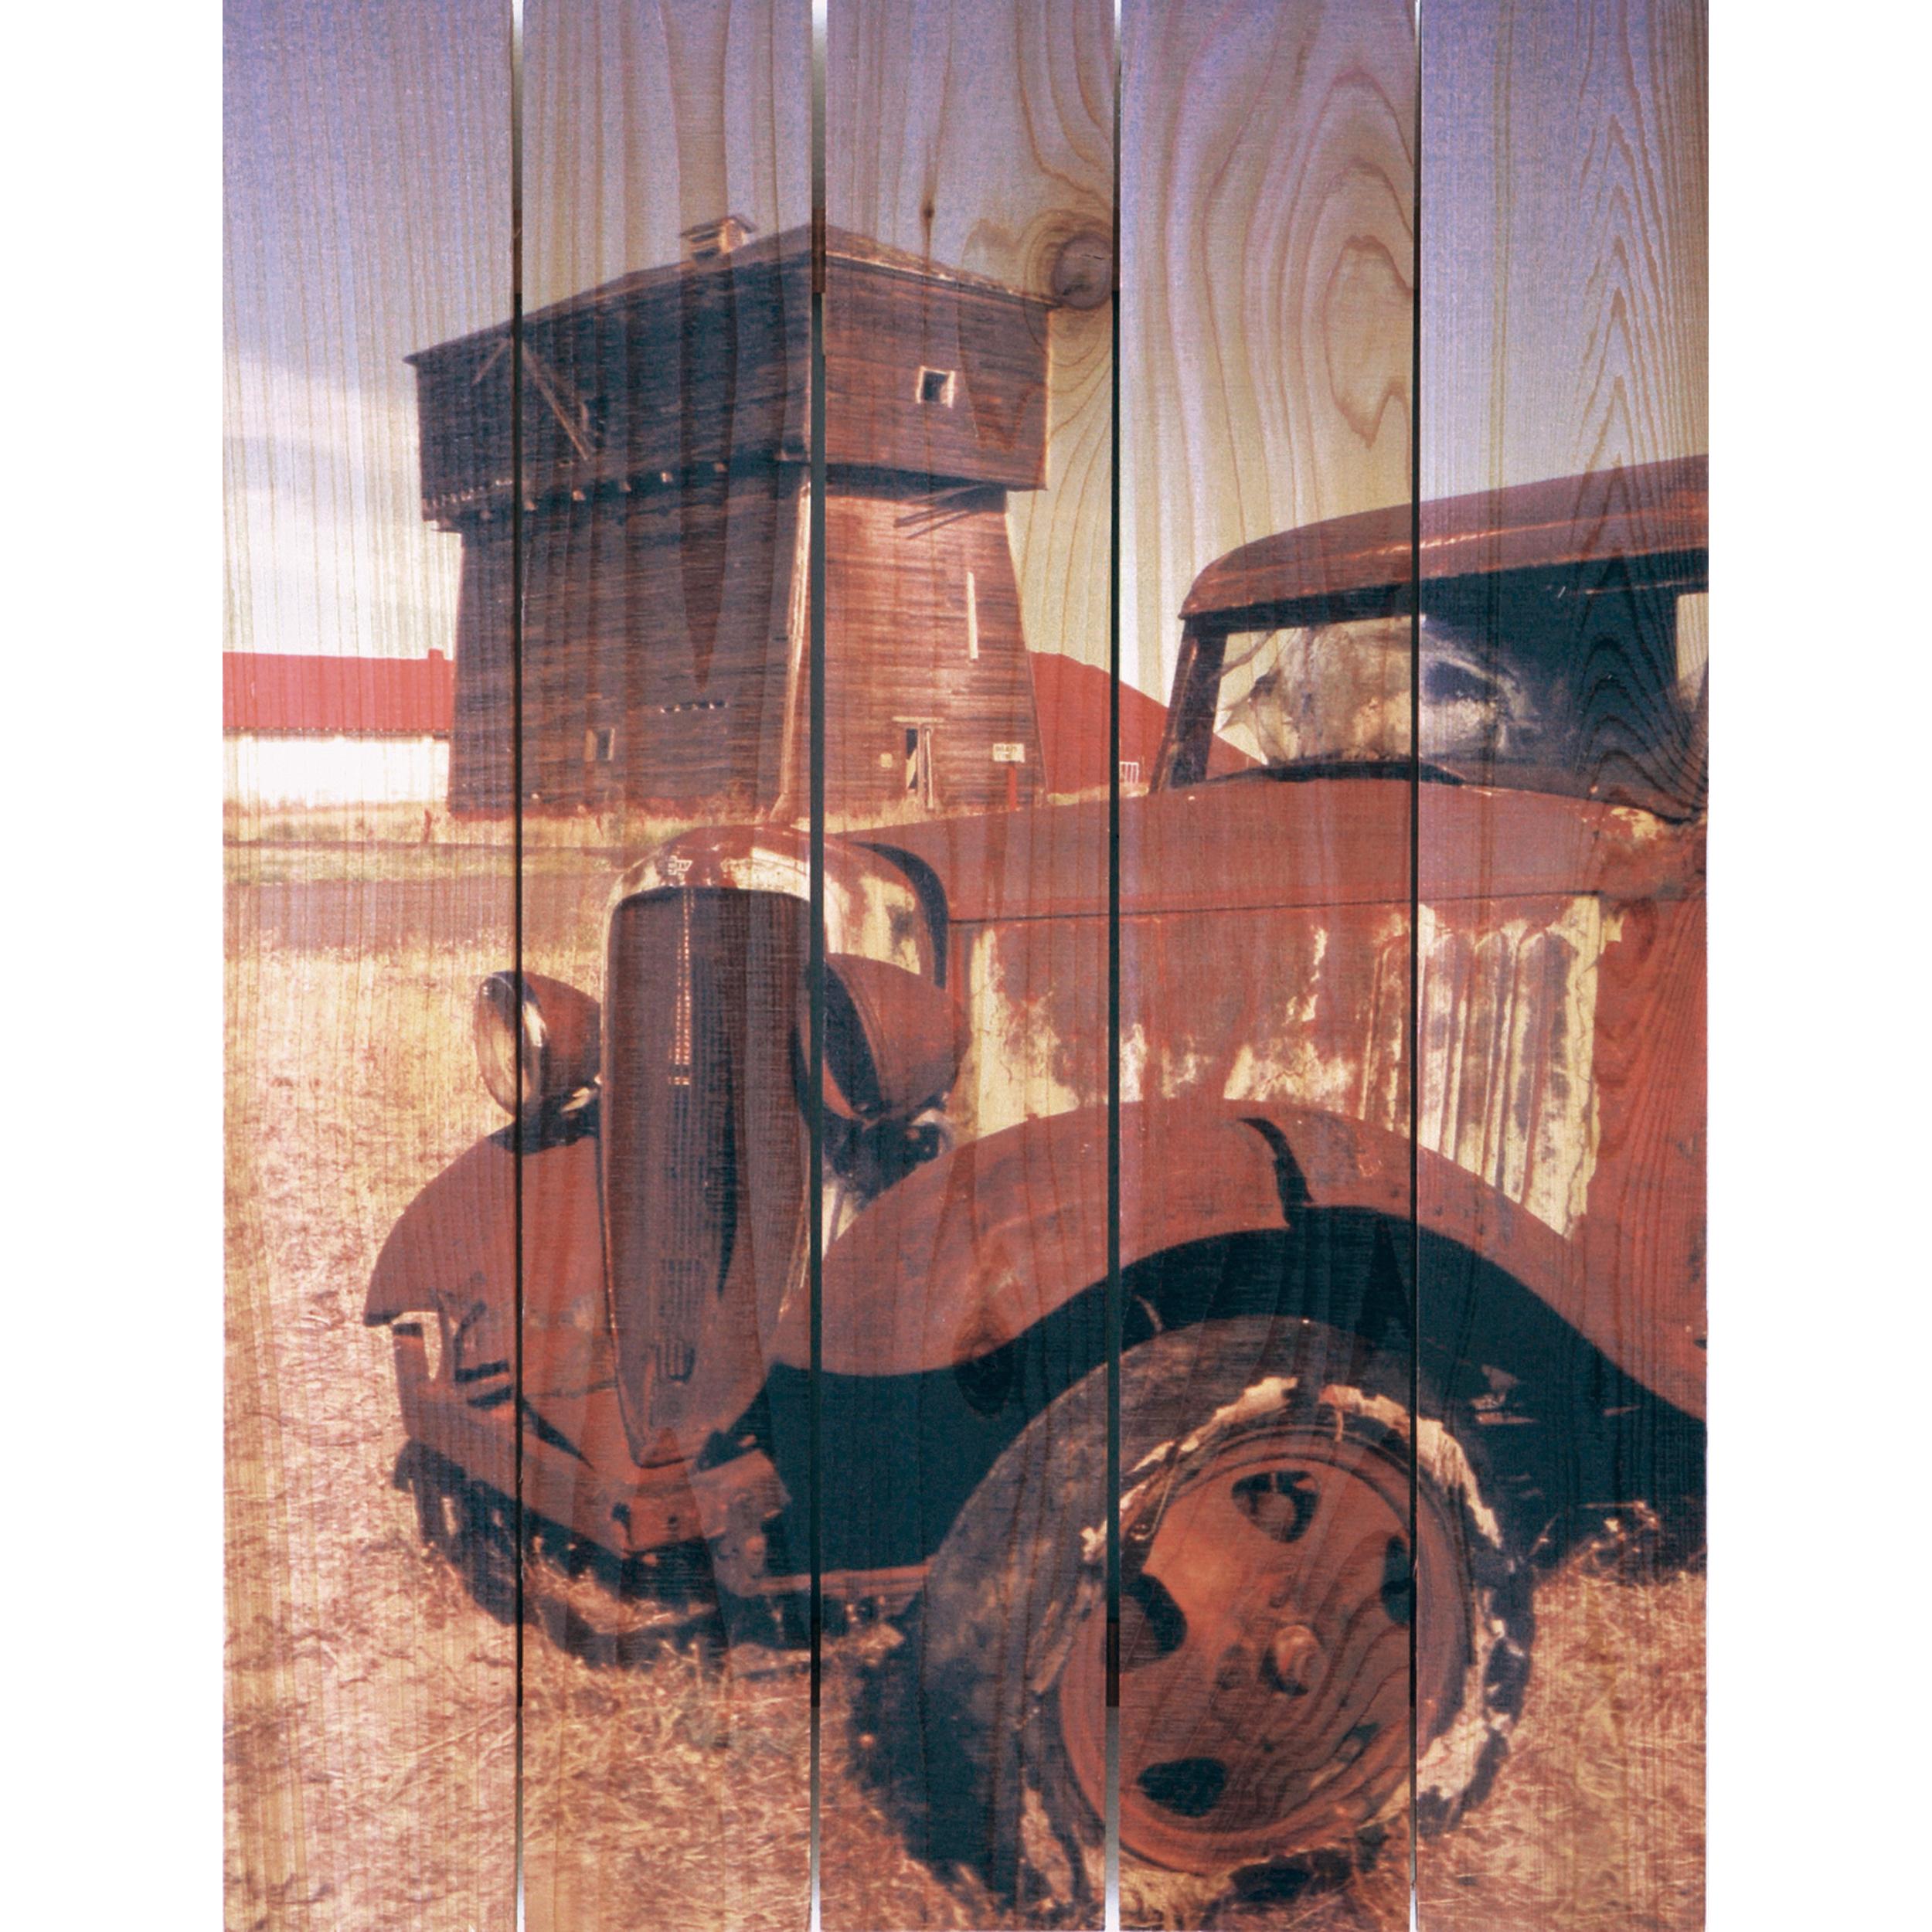 Daydream Gizaun Cedar Wall Art, Rust Bucket, 28